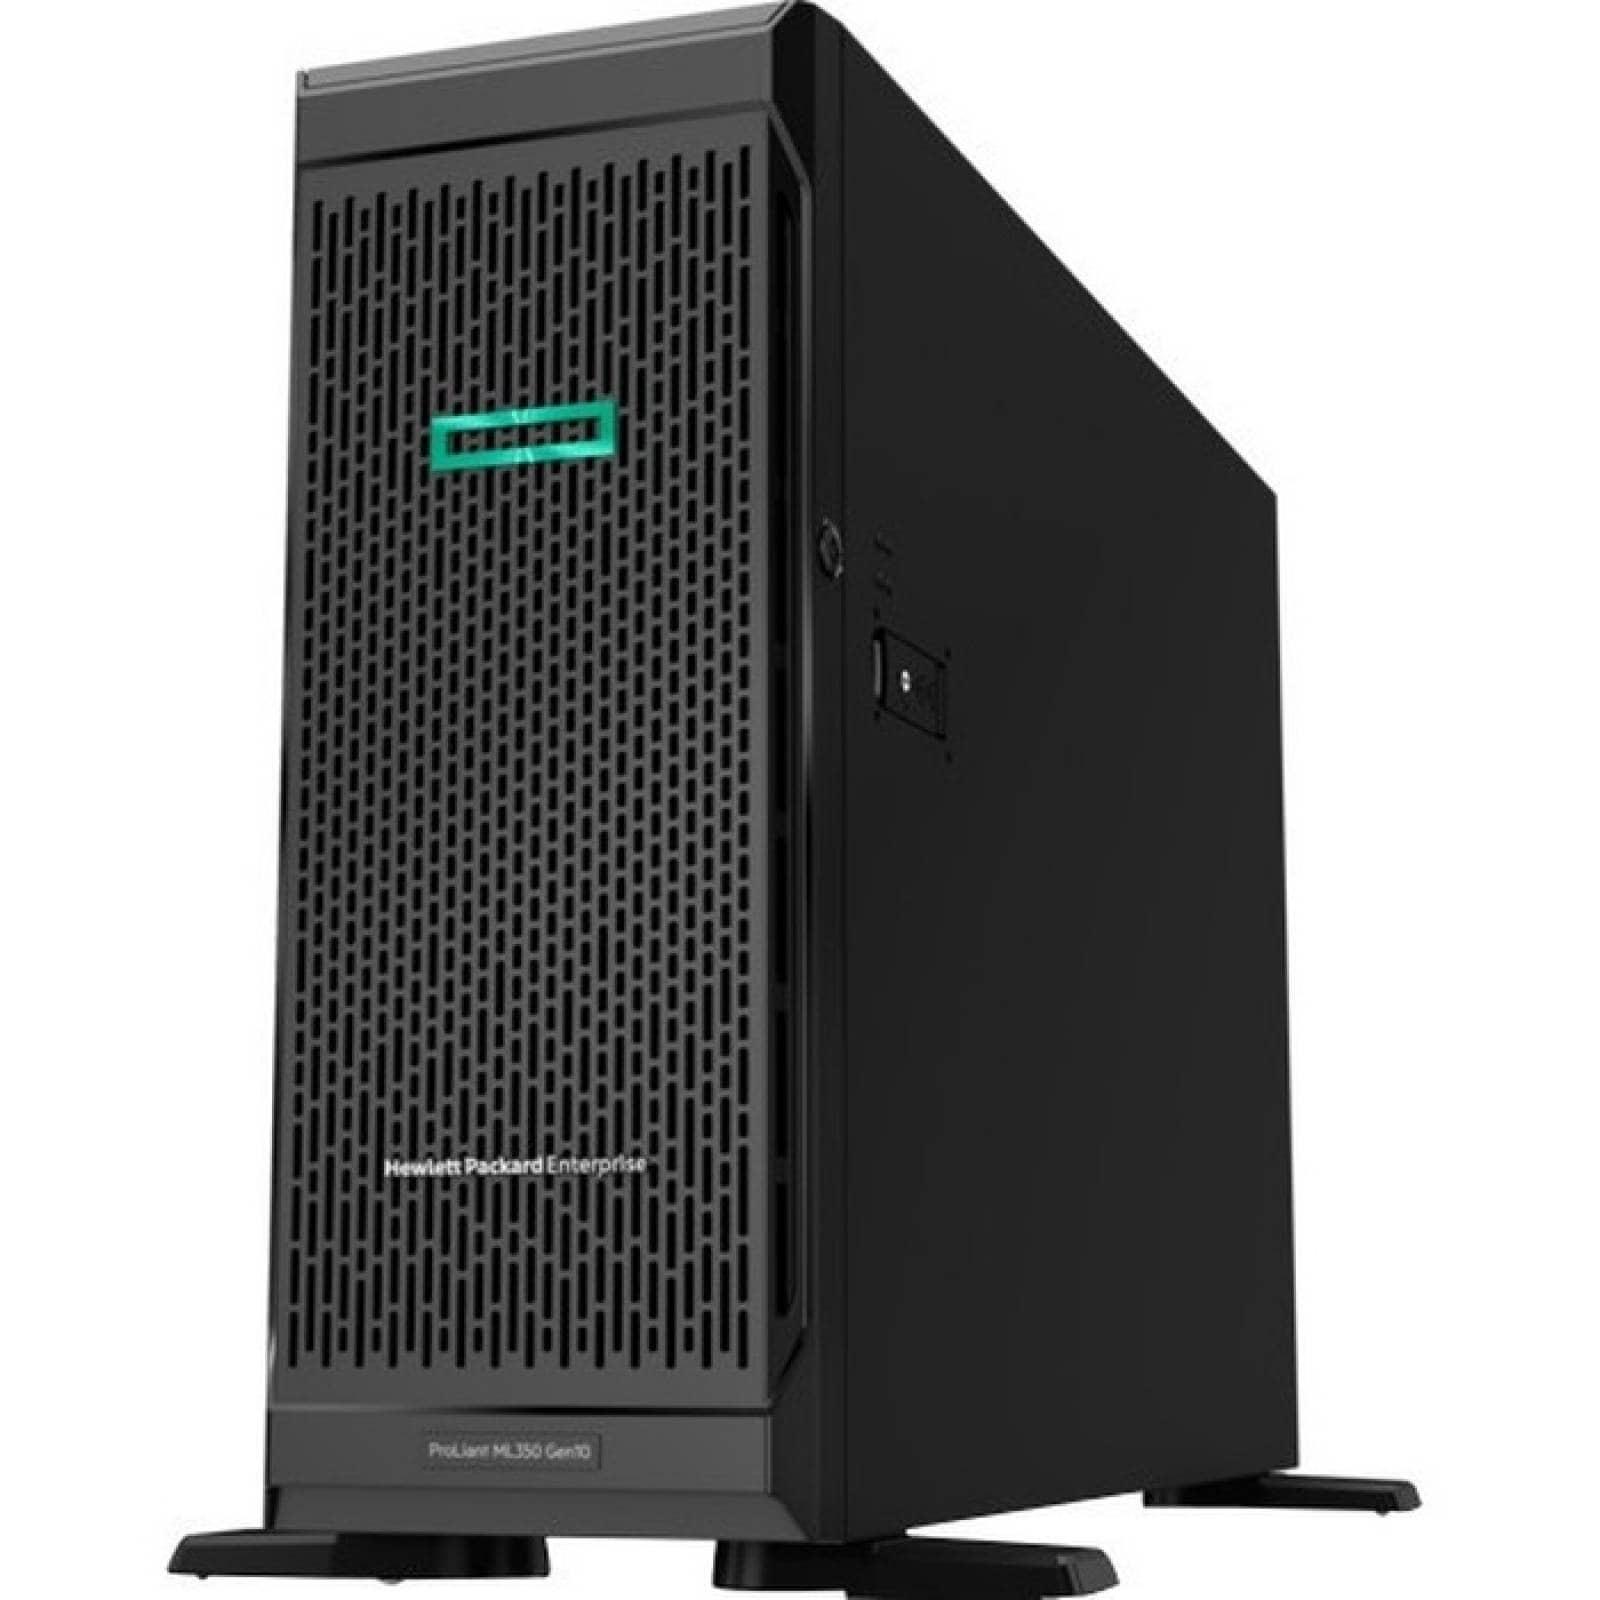 HPE ProLiant ML350 G10 4U Tower Server  1 x Intel Xeon Silver 4110 Octacore (8 Core) 210 GHz  16 GB SDRAM DDR4 insta